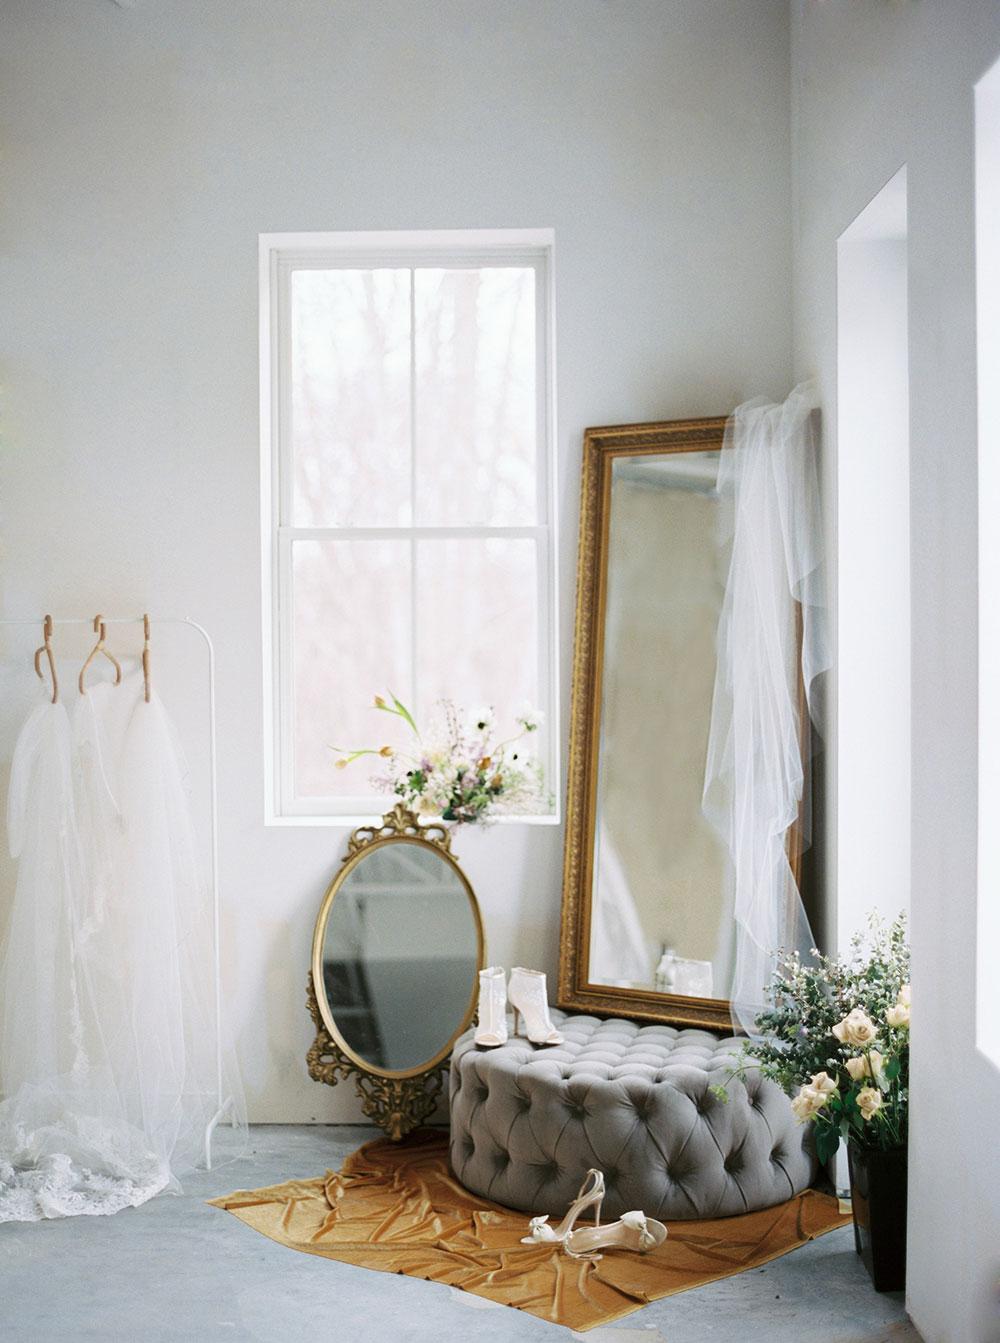 mStarr-your-dream-bridal-150.jpg